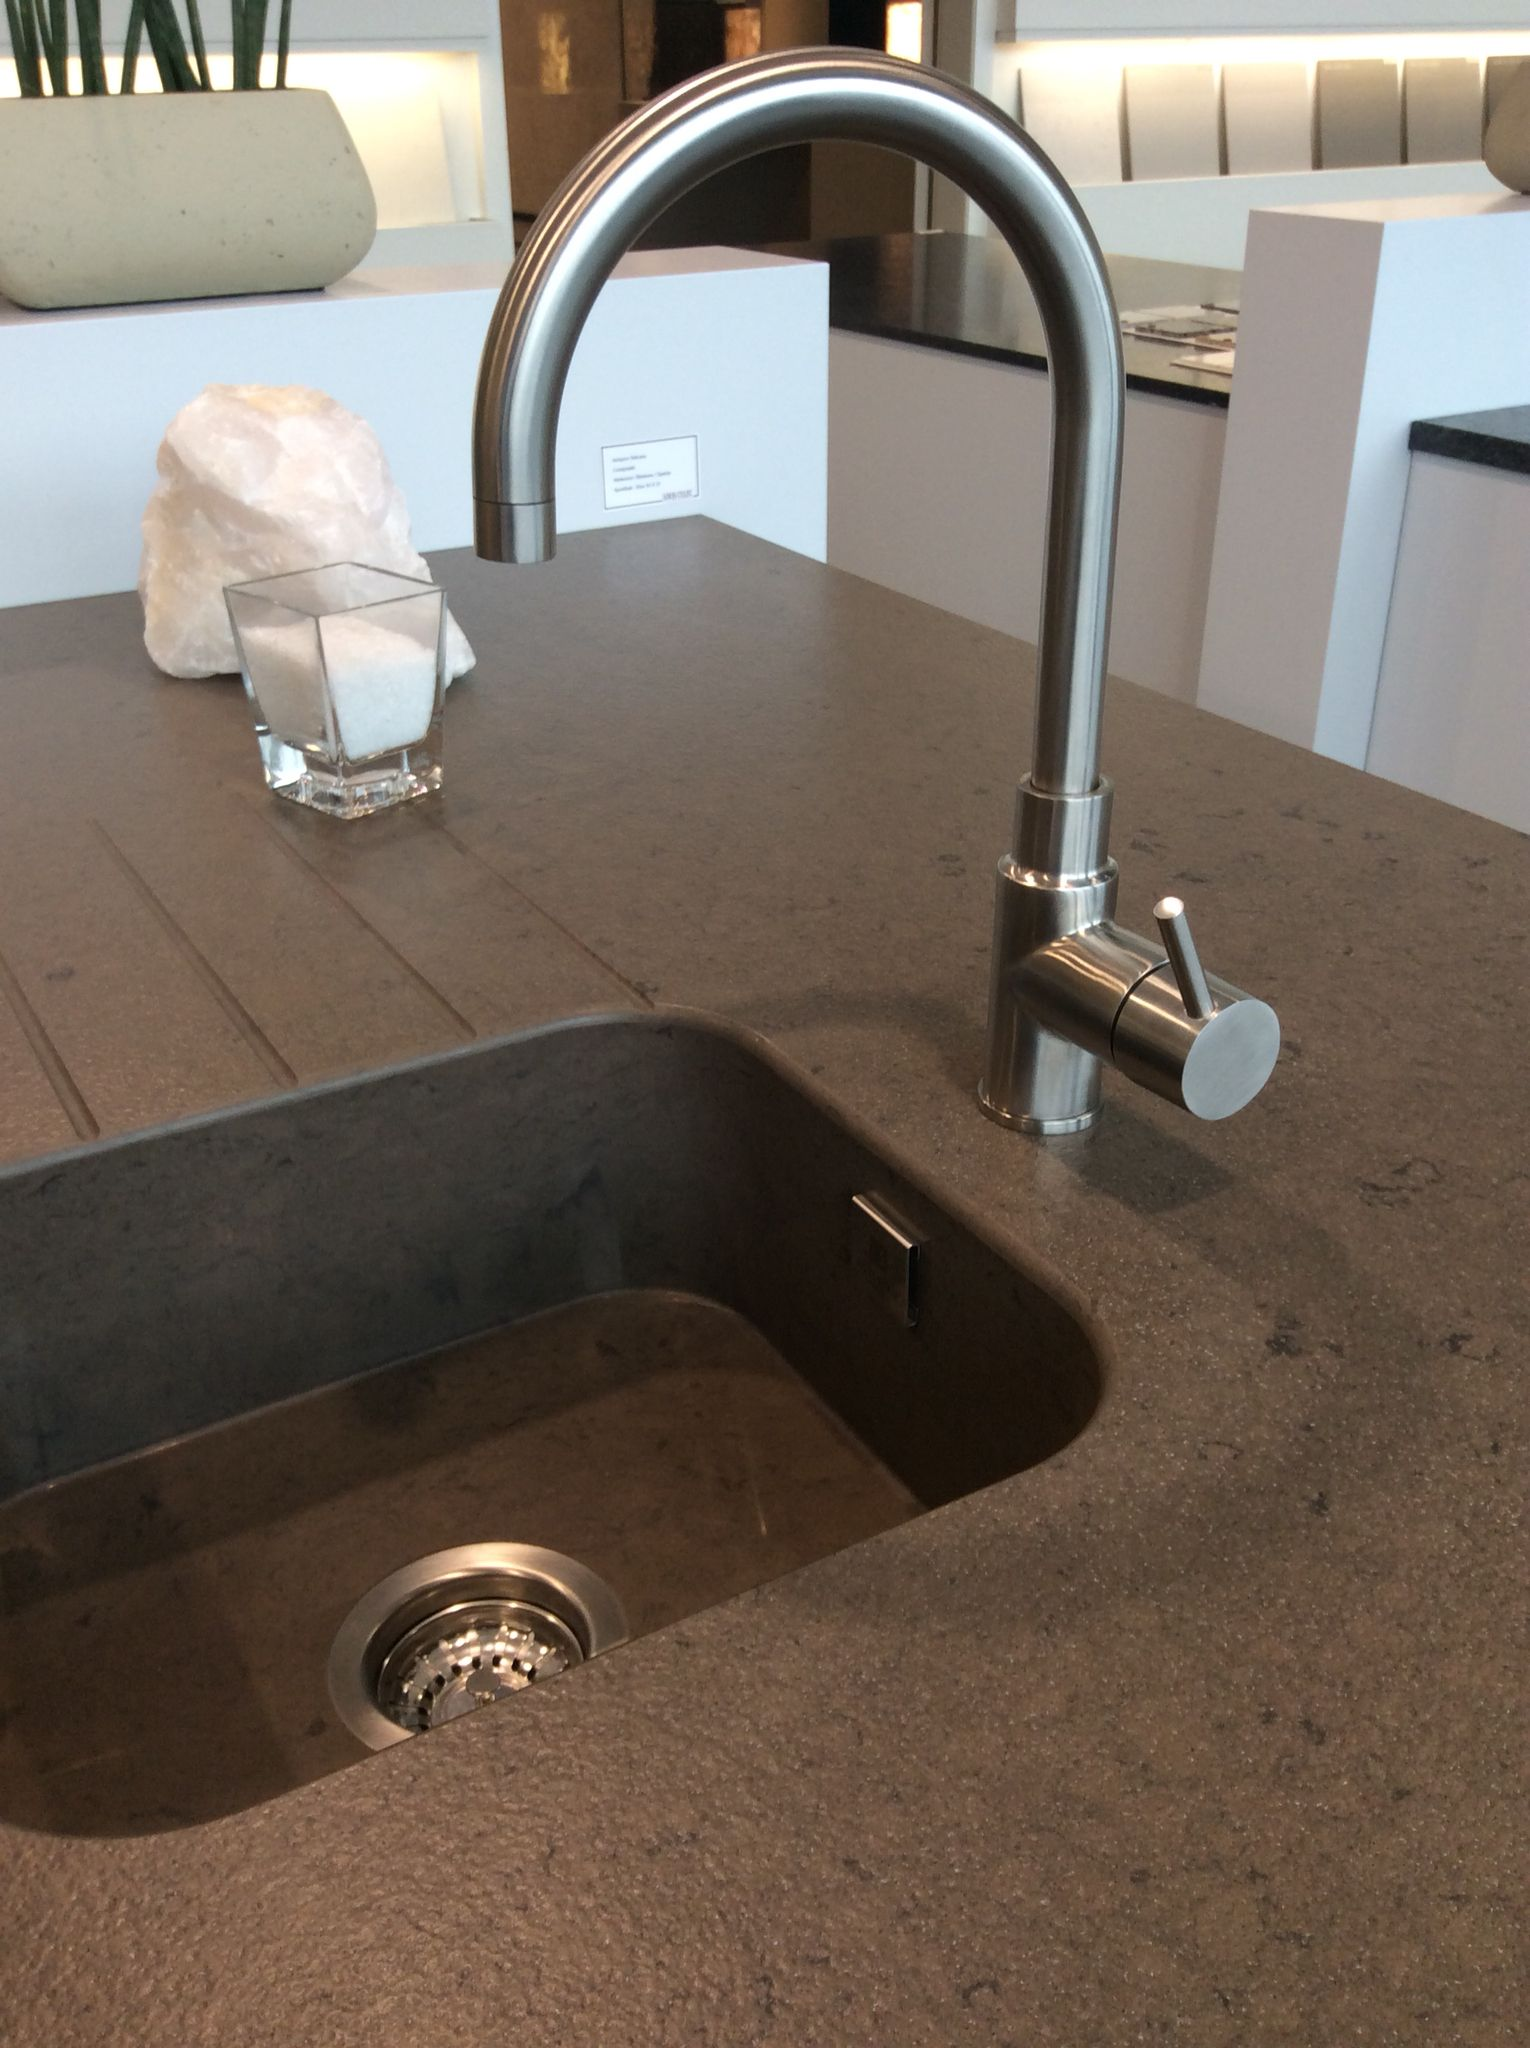 Silestone Amazon Volcano Integrity Sink Louis Culot Keukenwerkbladen Kuche